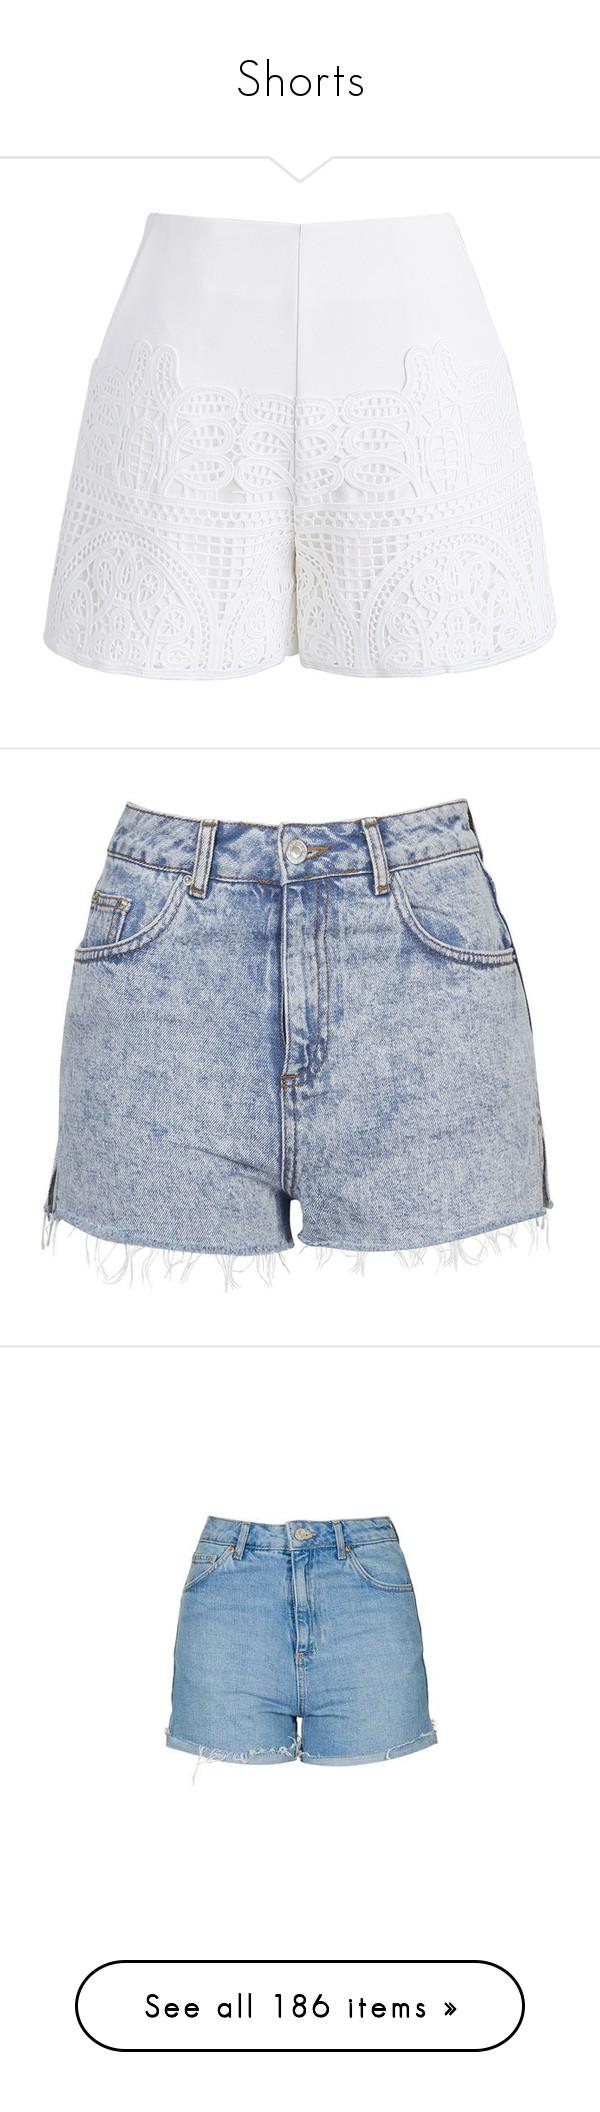 """Shorts"" by isthelastofus ❤ liked on Polyvore featuring shorts, white, crochet shorts, white crochet shorts, white ruffle shorts, white shorts, cutoff shorts, bottoms, short and denim shorts"